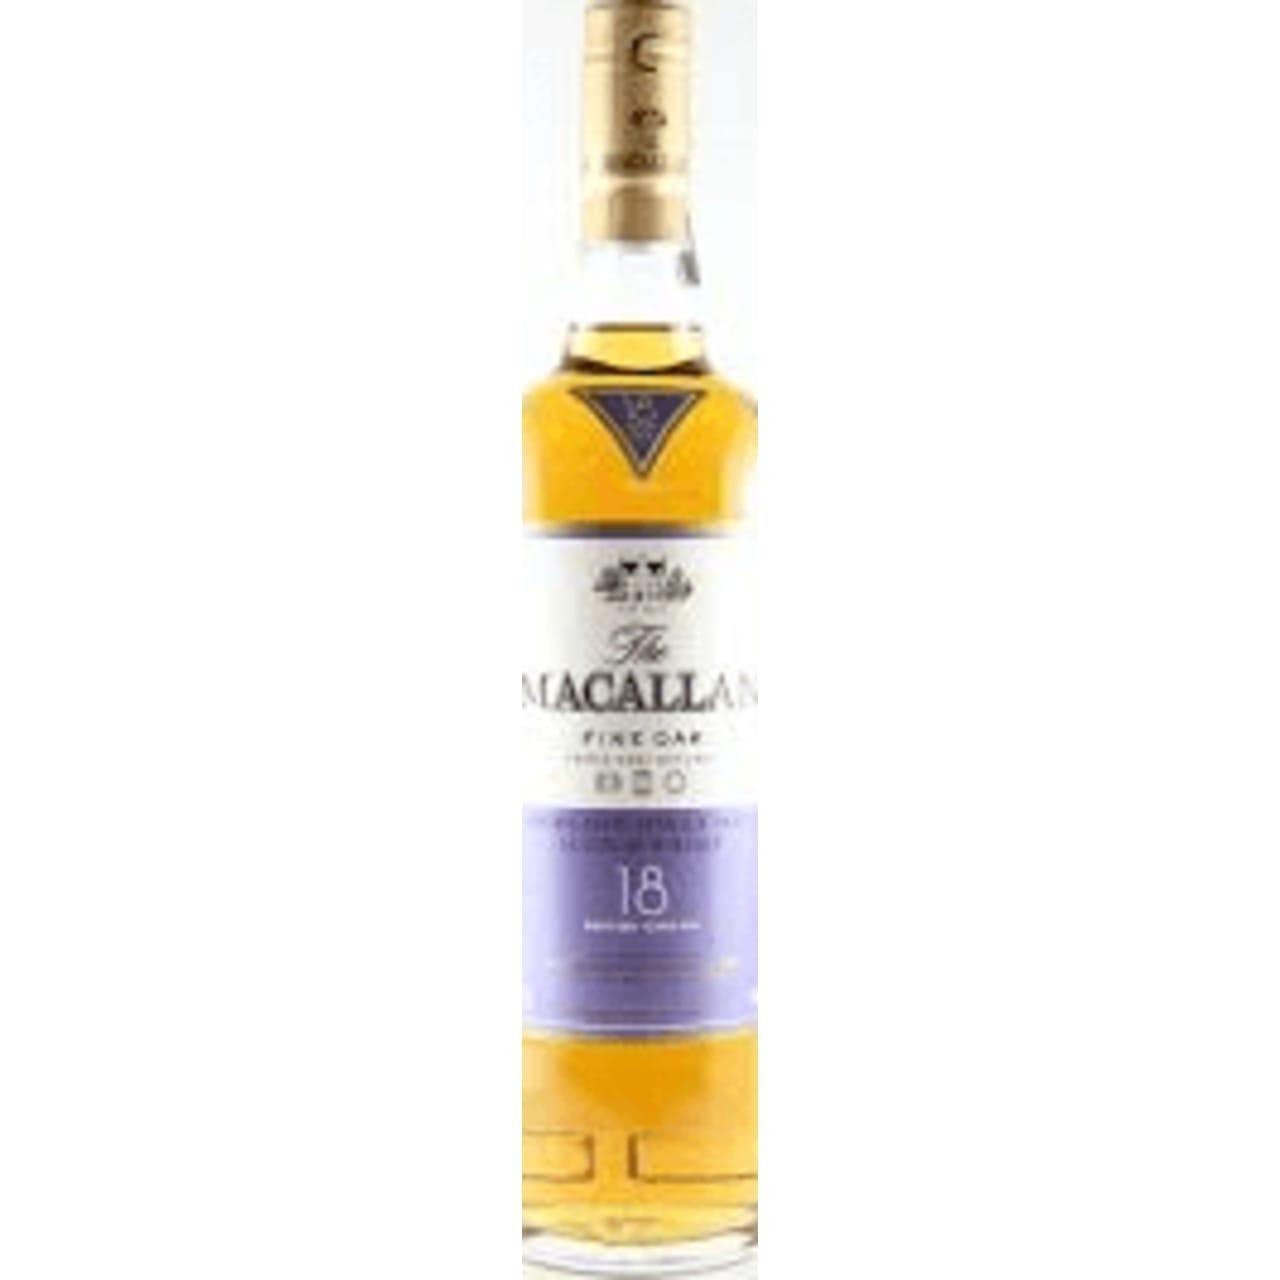 Product Image - The Macallan 18yo Triple Cask Single Malt